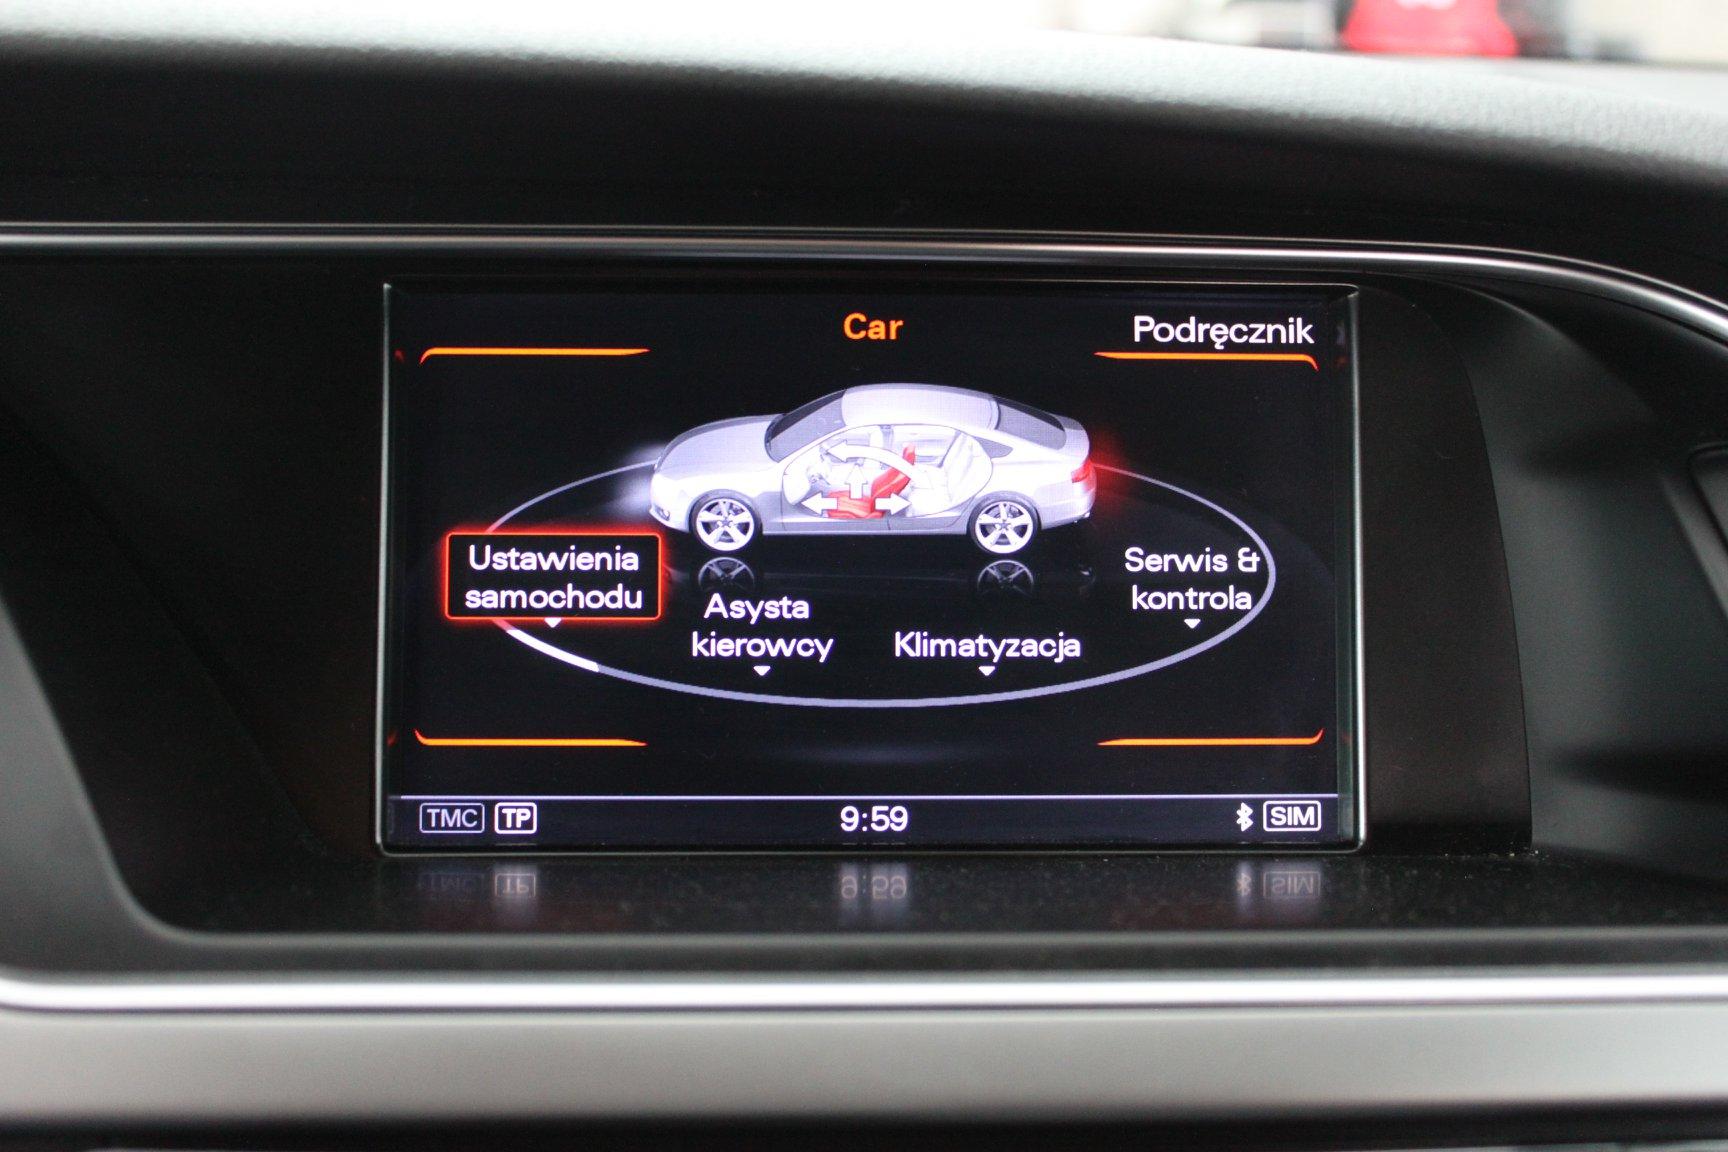 AUDI A5 SPORTBACK 2015 2.0 TFSI QUATTRO